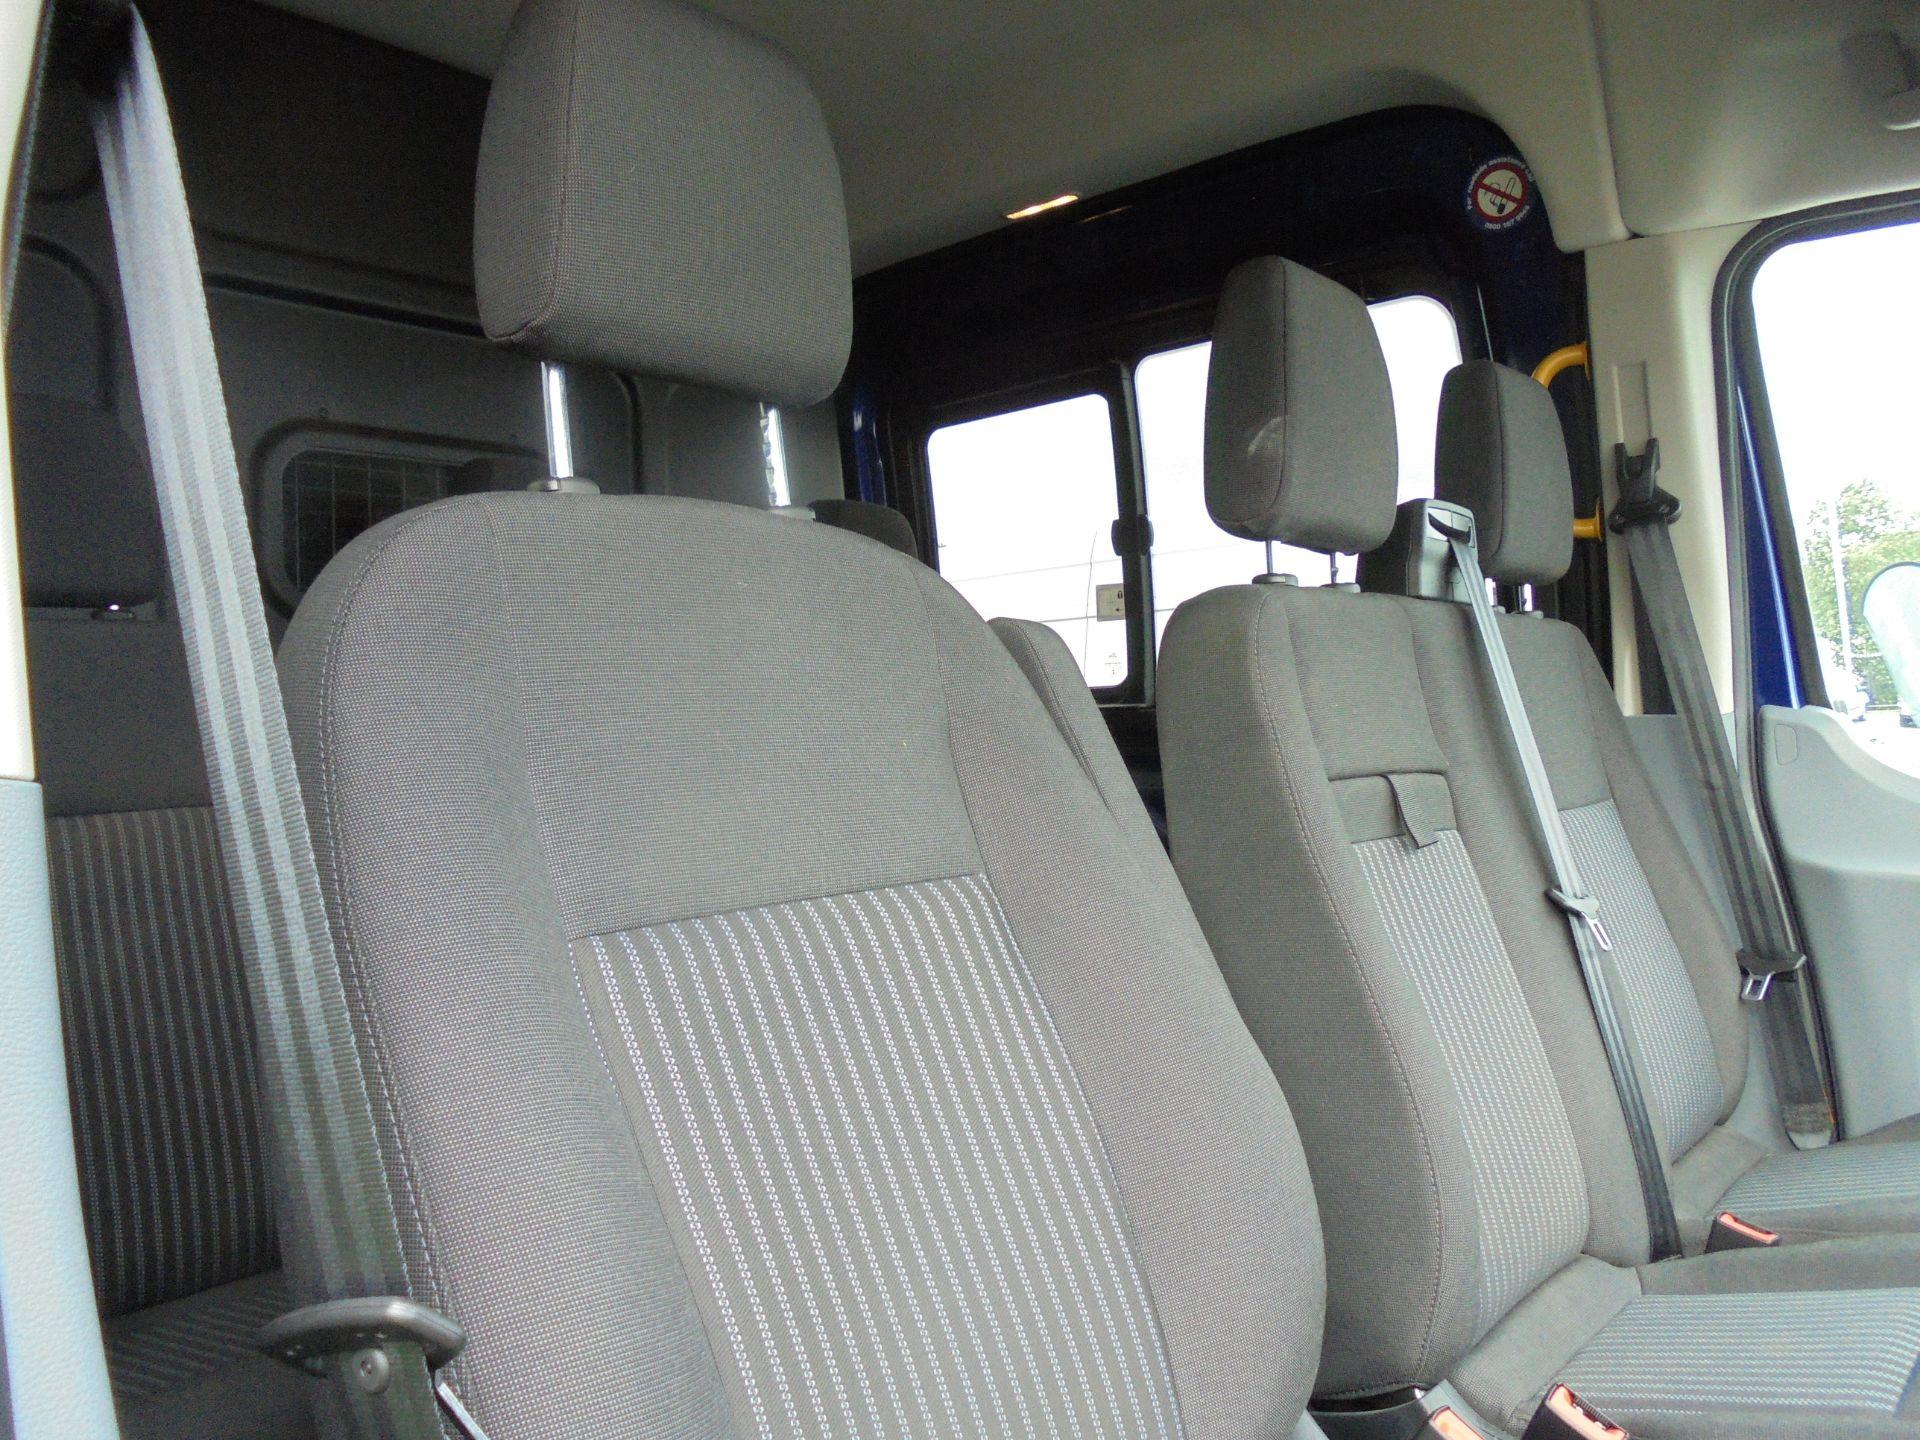 2018 Ford Transit 2.0 Tdci 130Ps H2 D/Cab Van Air/con (WU68PJX) Image 19